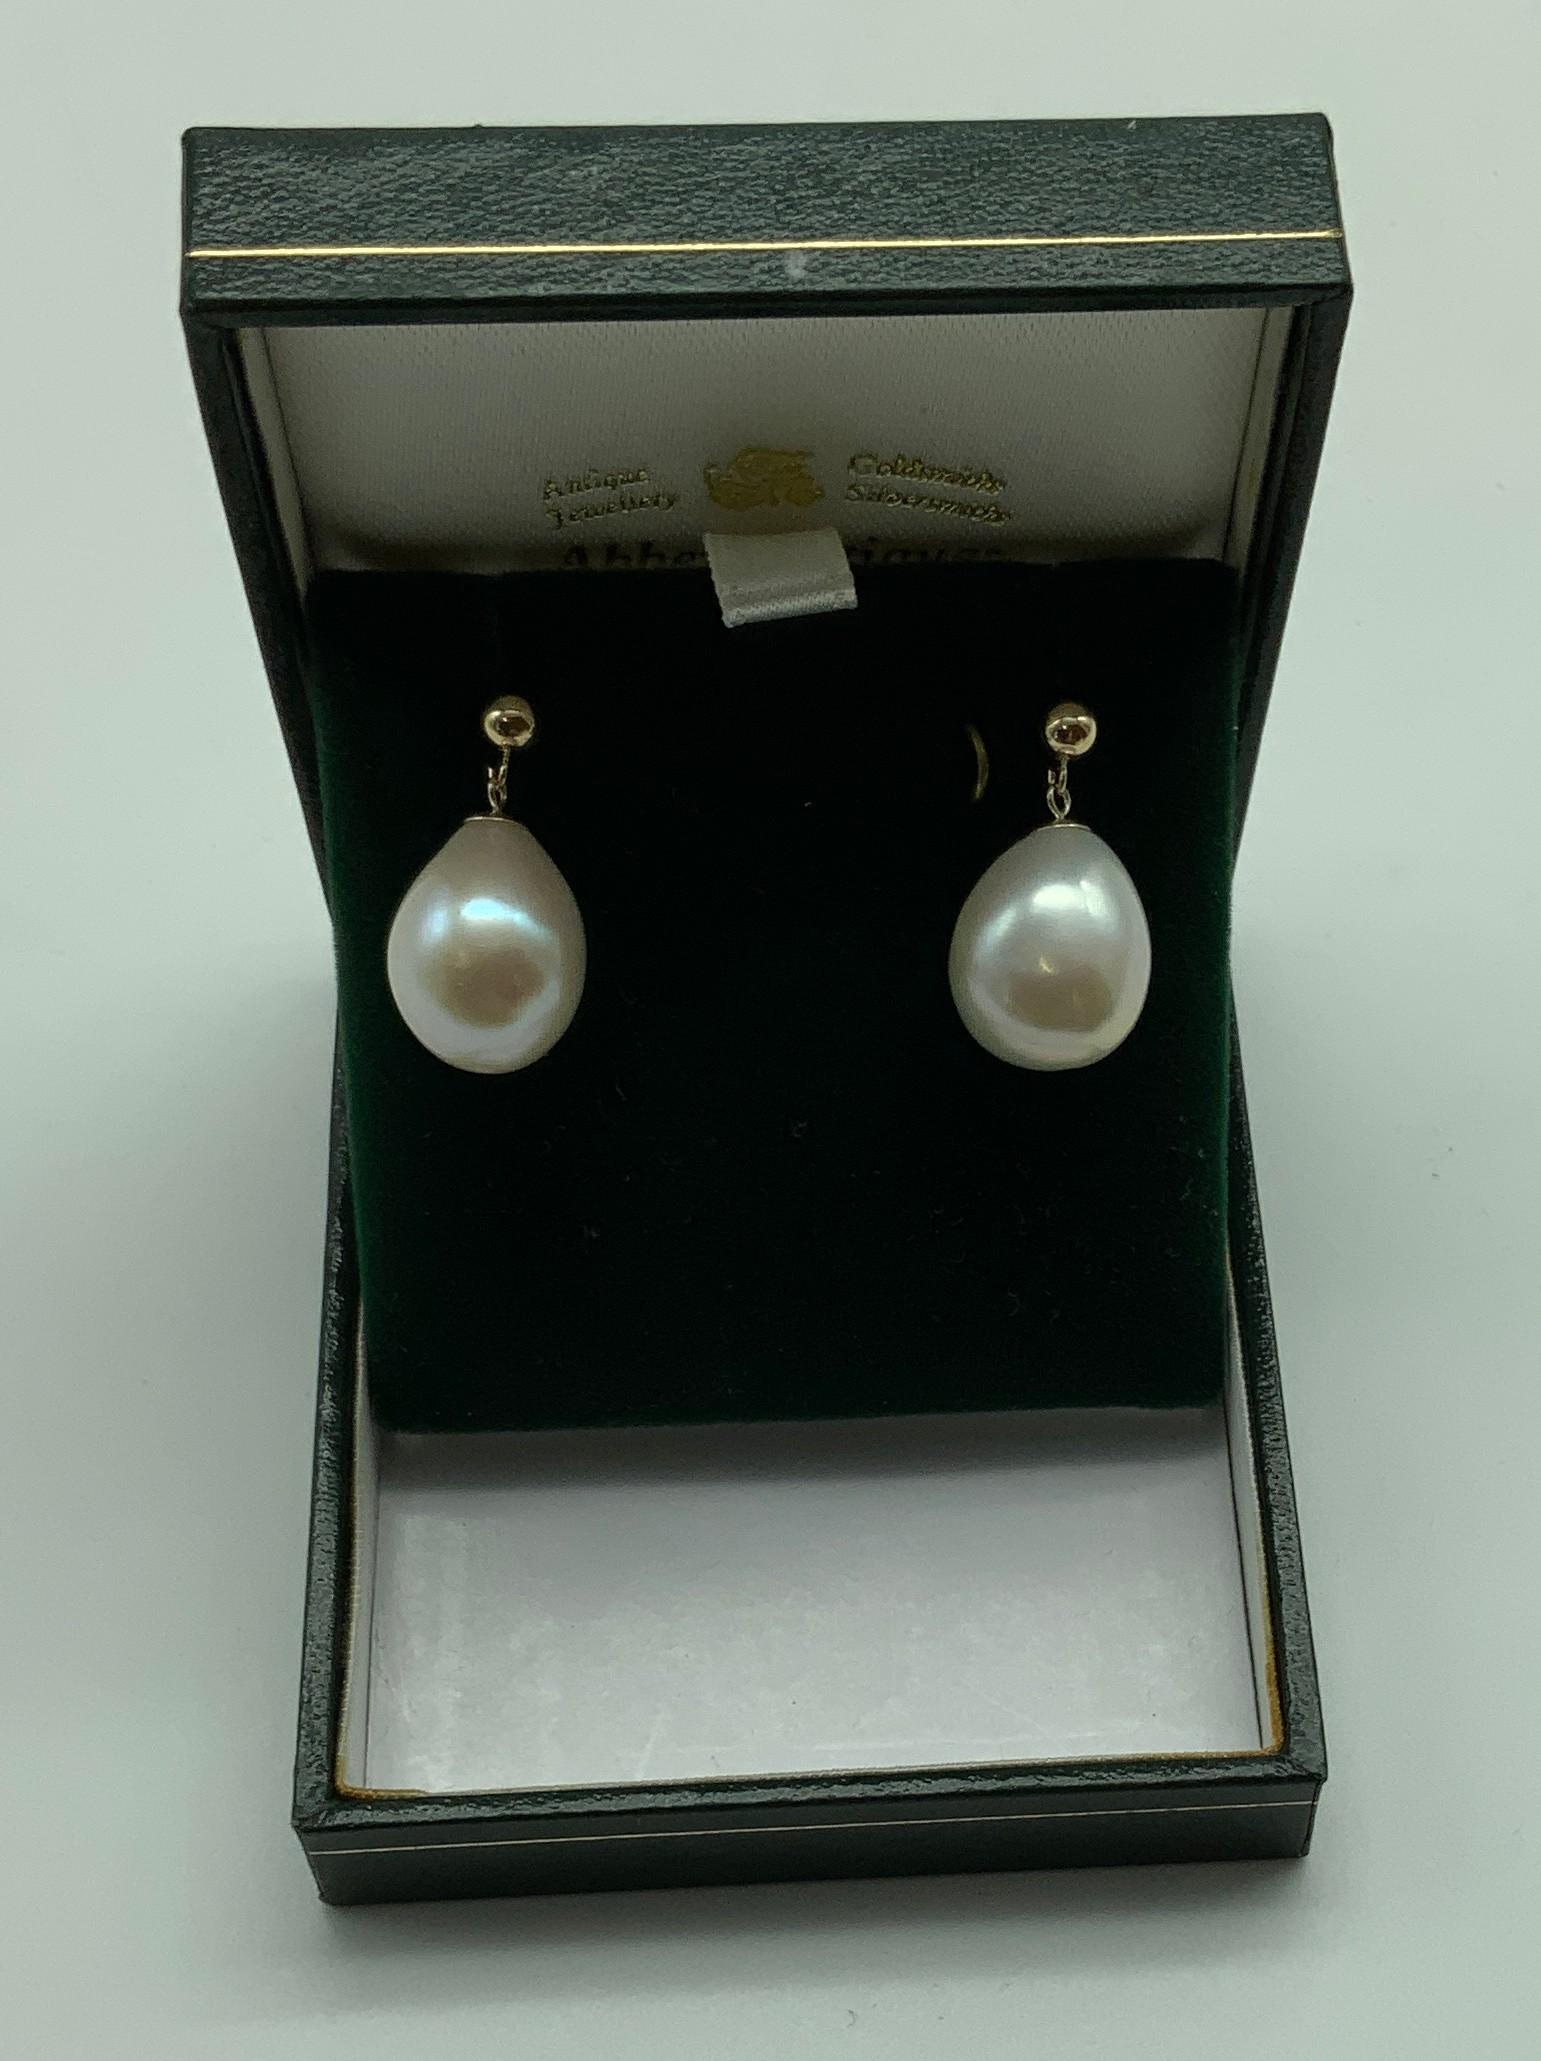 New unworn 9ct gold large south sea pearl earrings - Image 2 of 2